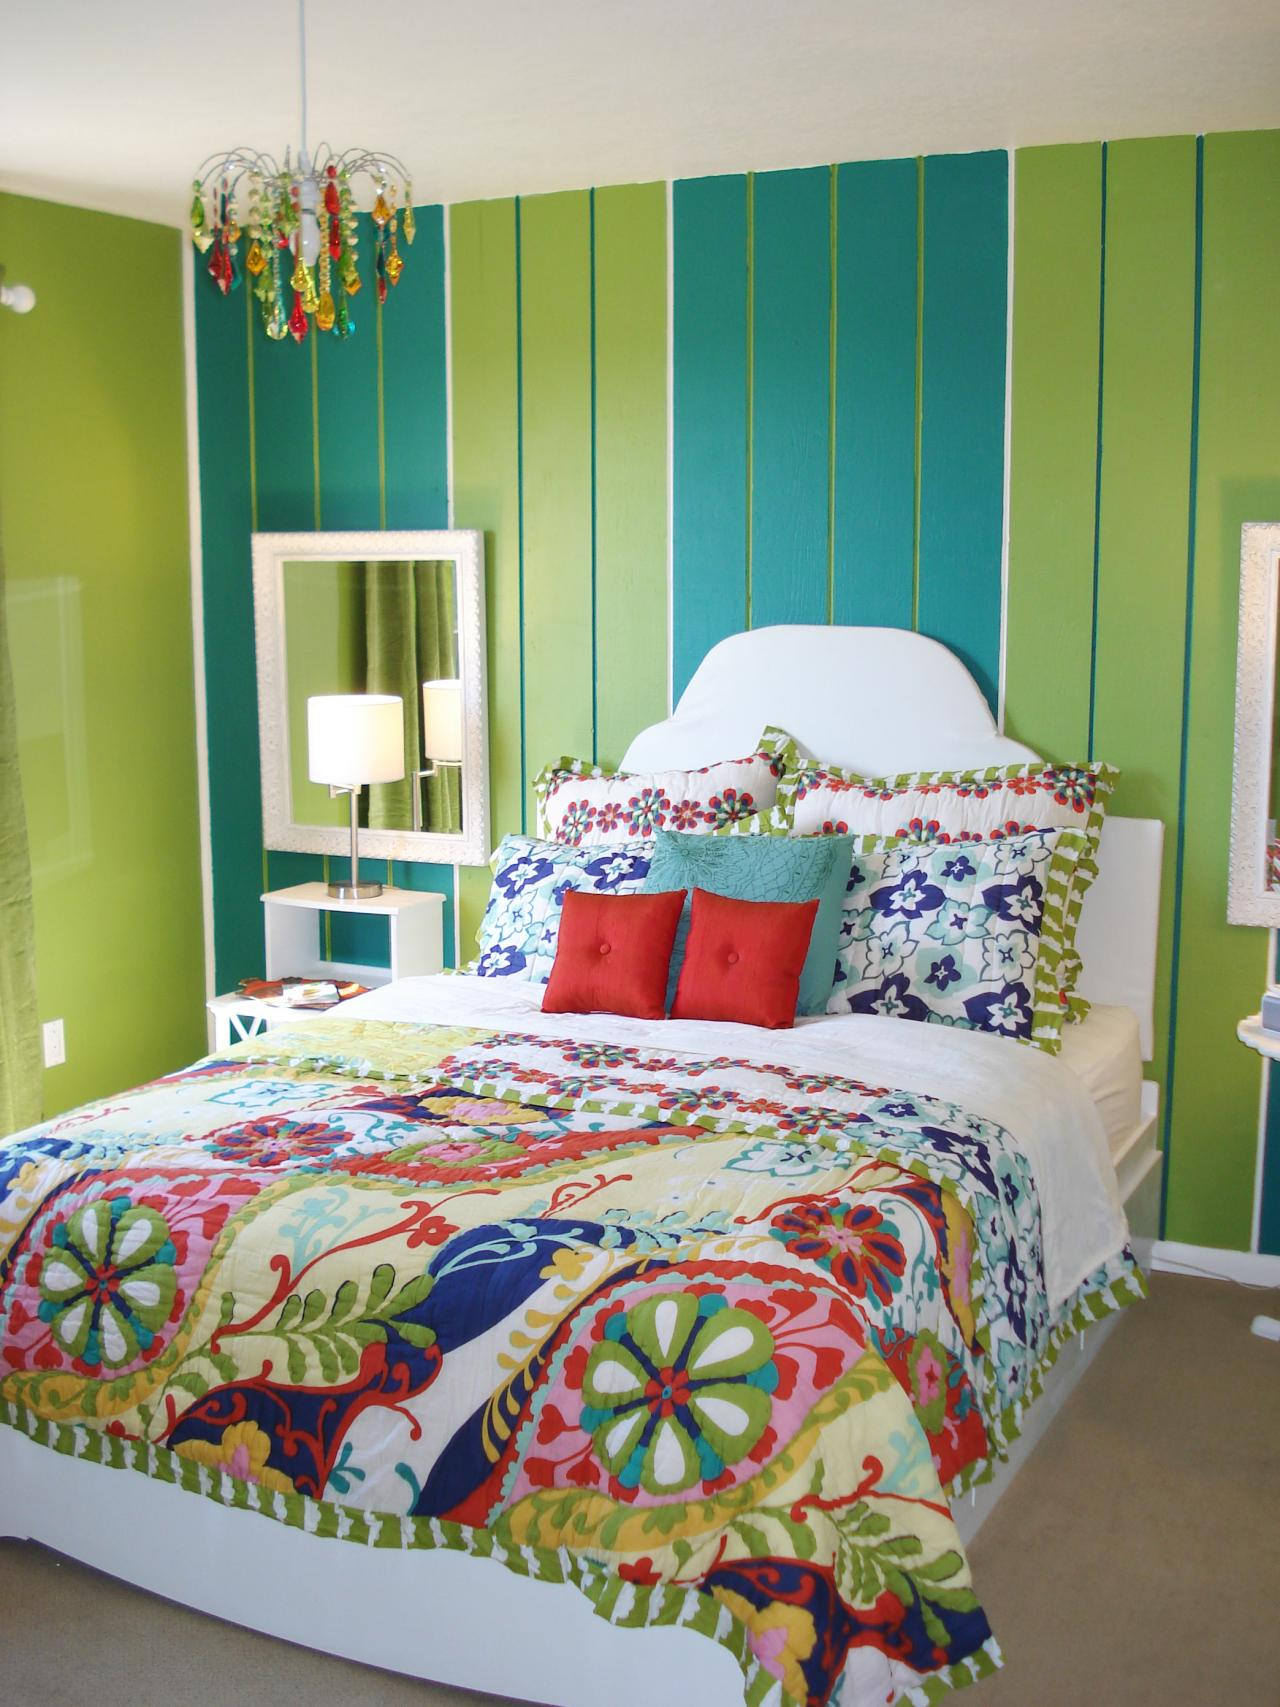 Como decorar dormitorio juvenil